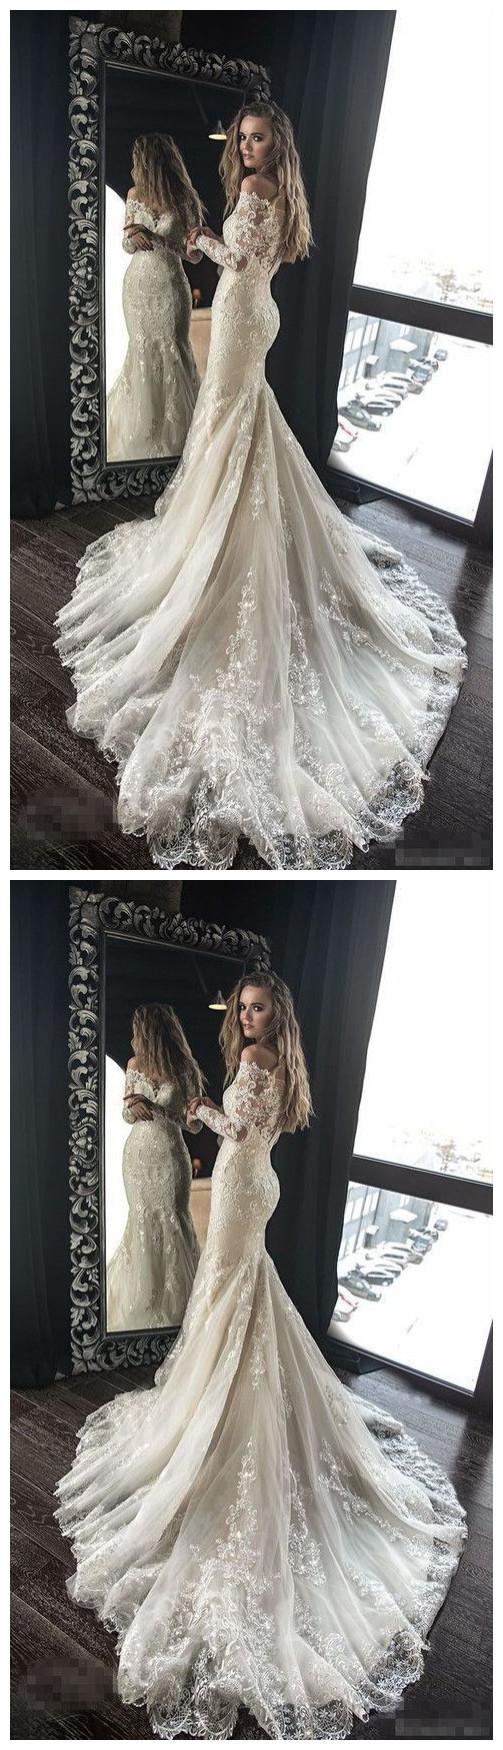 Lace Appliques Beaded Wedding Dresses,Mermaid Sheath Beautiful Bridal